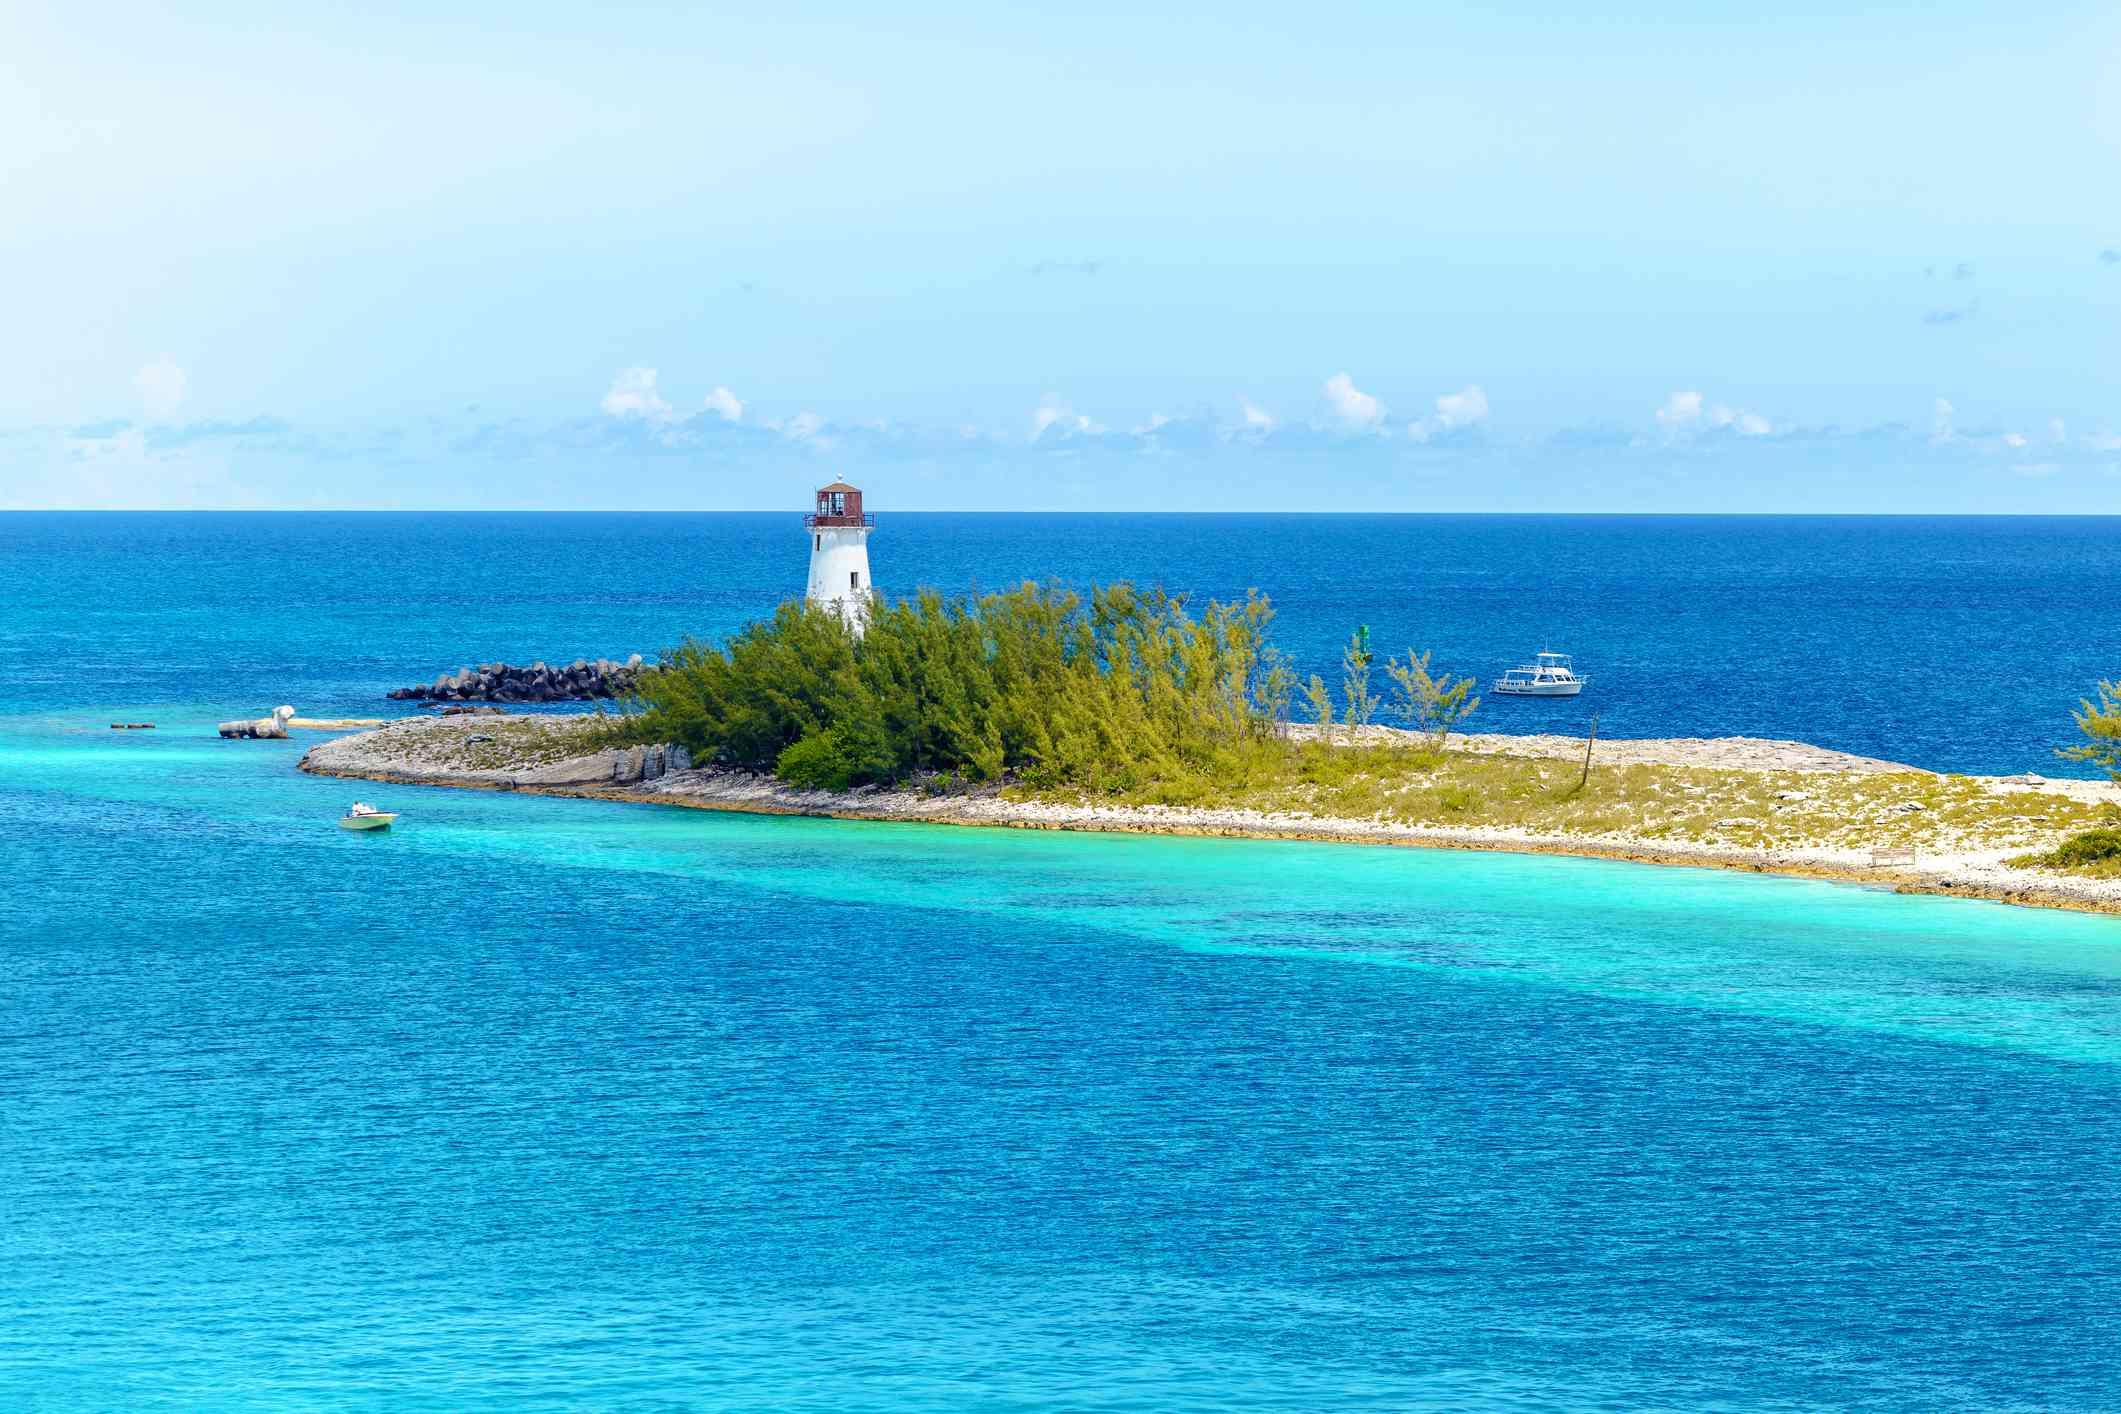 Scenic view of a lighthouse at Nassau, The Bahamas. Nassau beach with white sand coastline and deep blue sea, The Bahamas